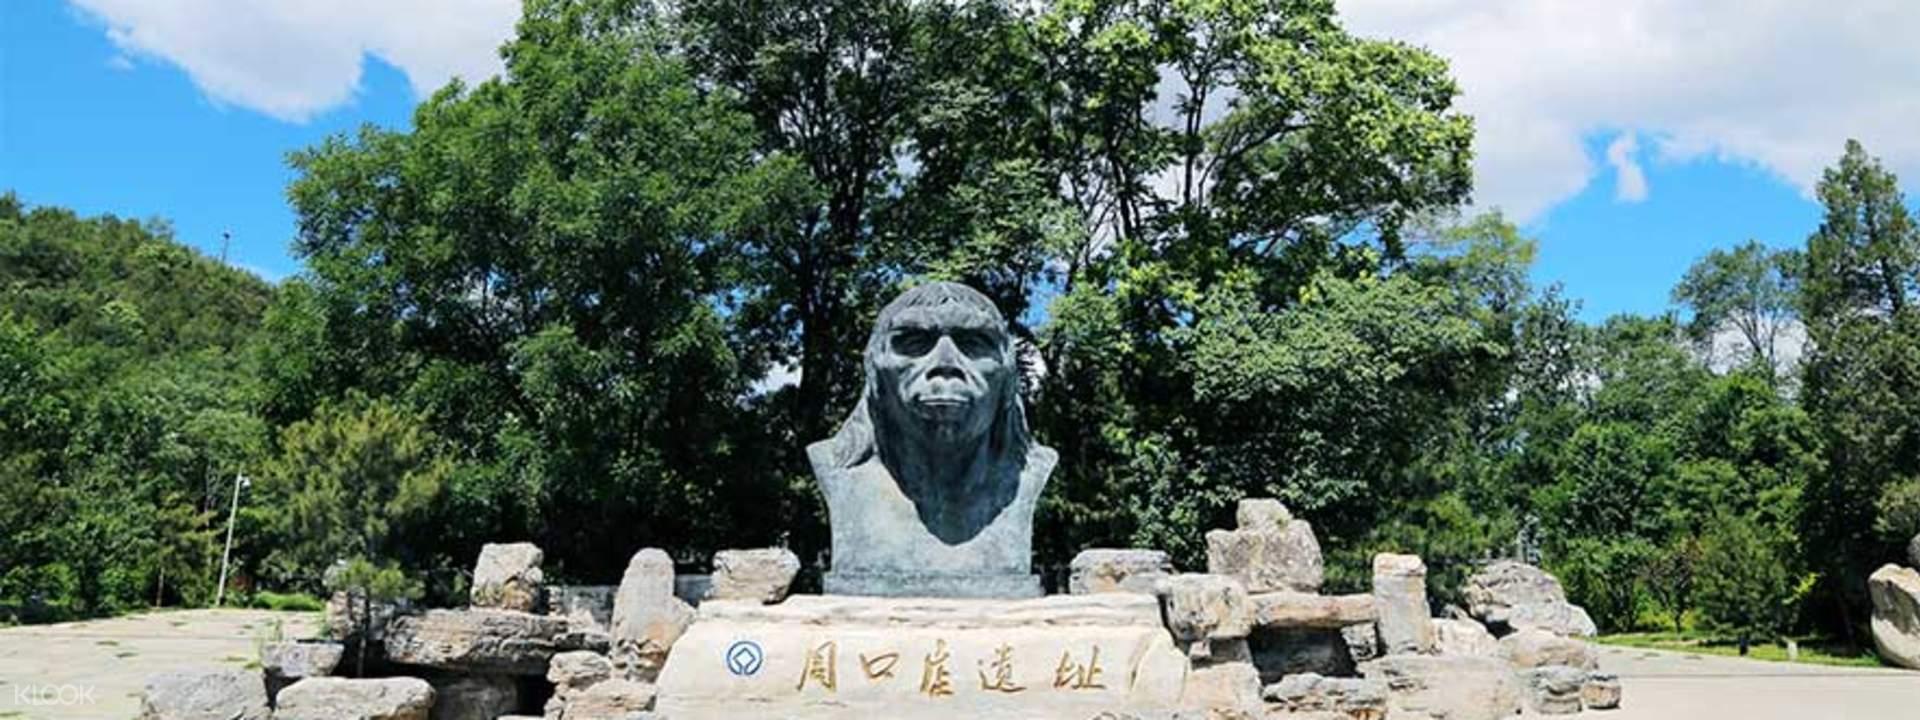 Zhoukoudian Zhoukoudian Excavation Sites and Museum